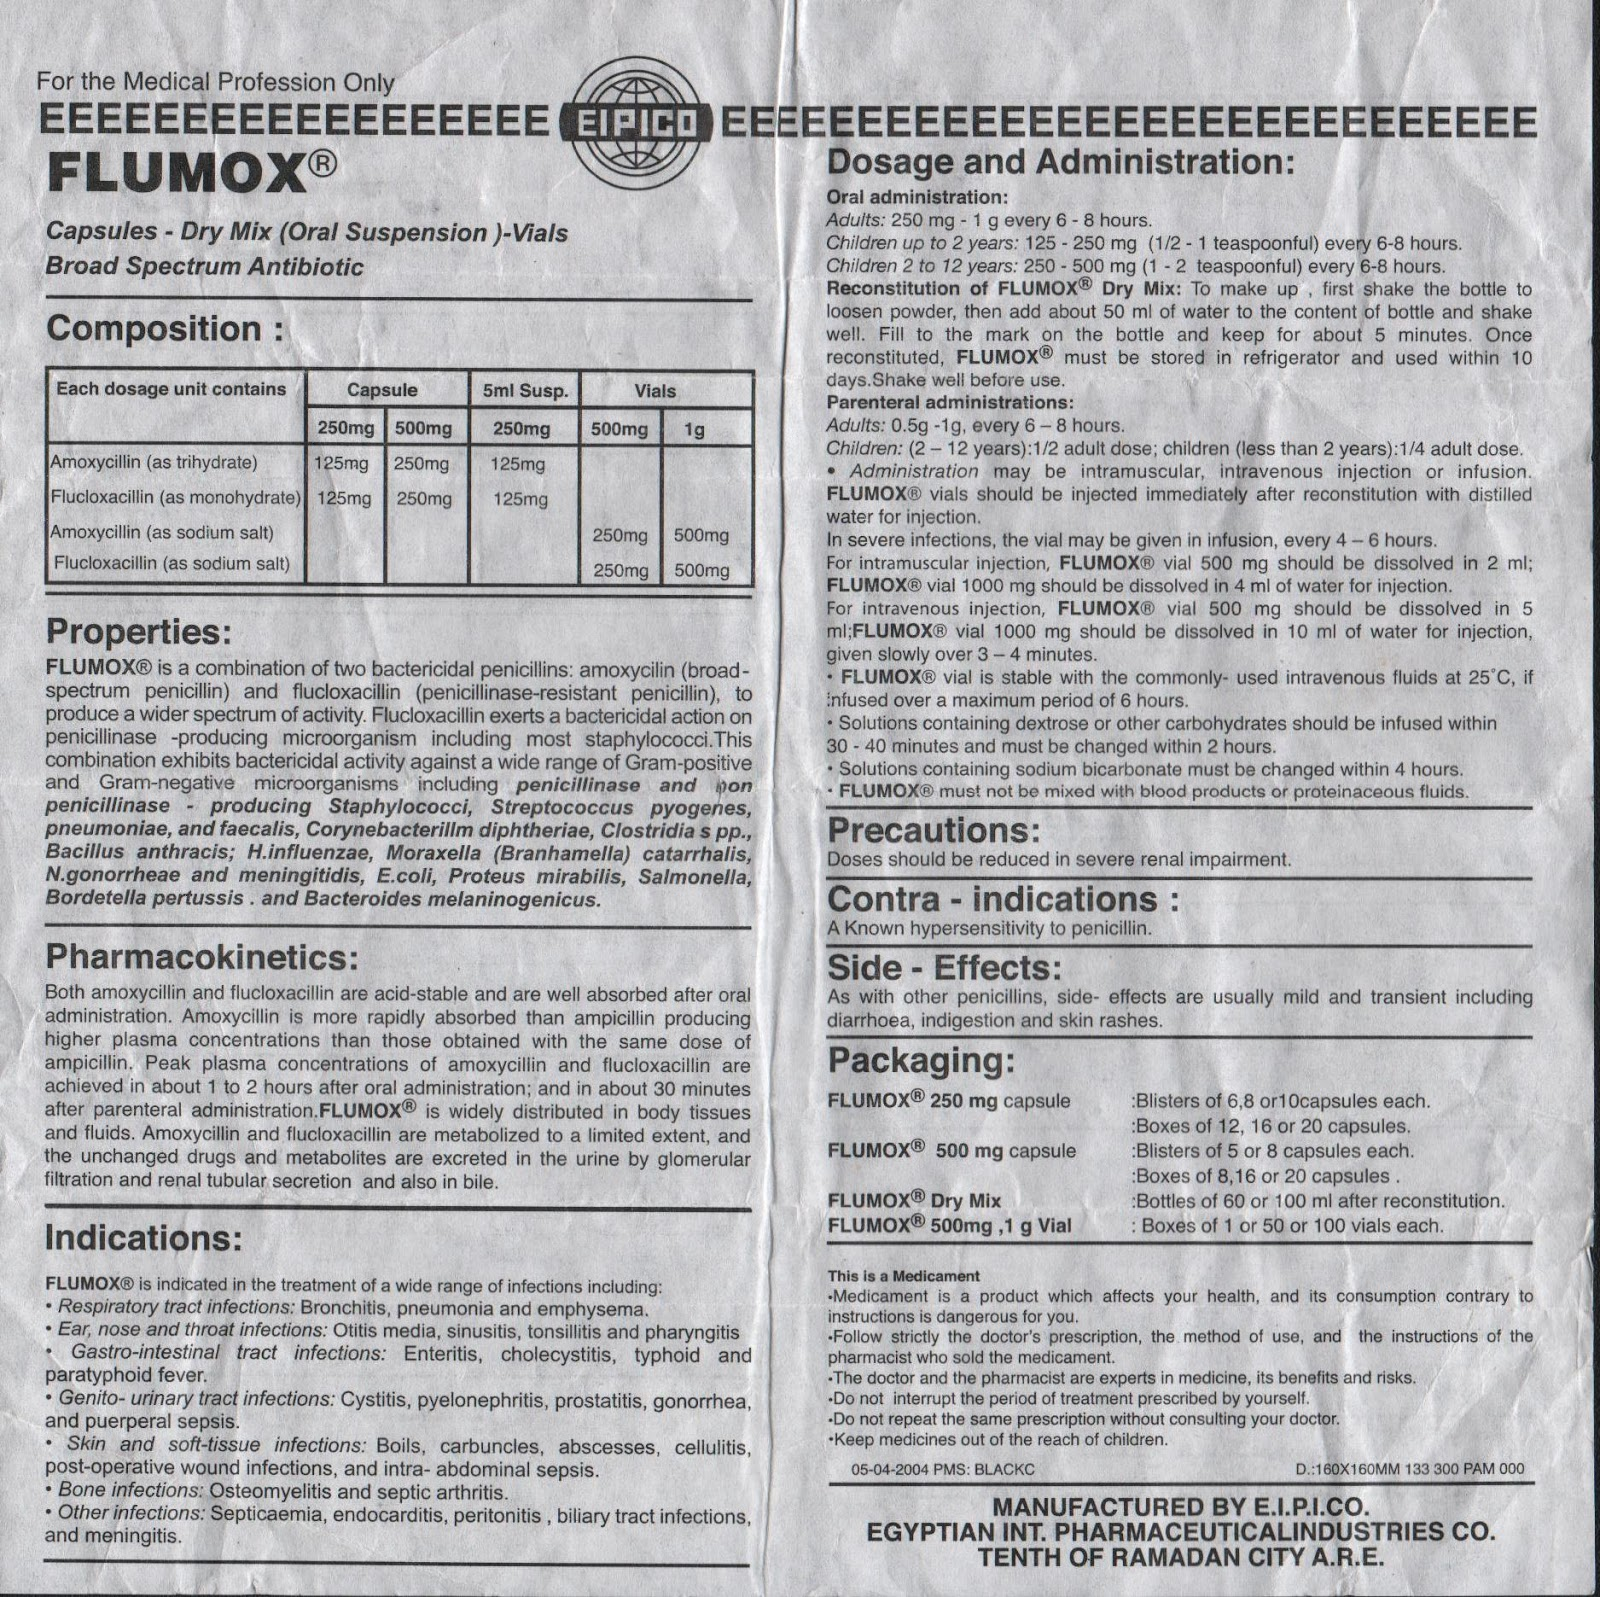 Dosage of flucloxacillin for adults